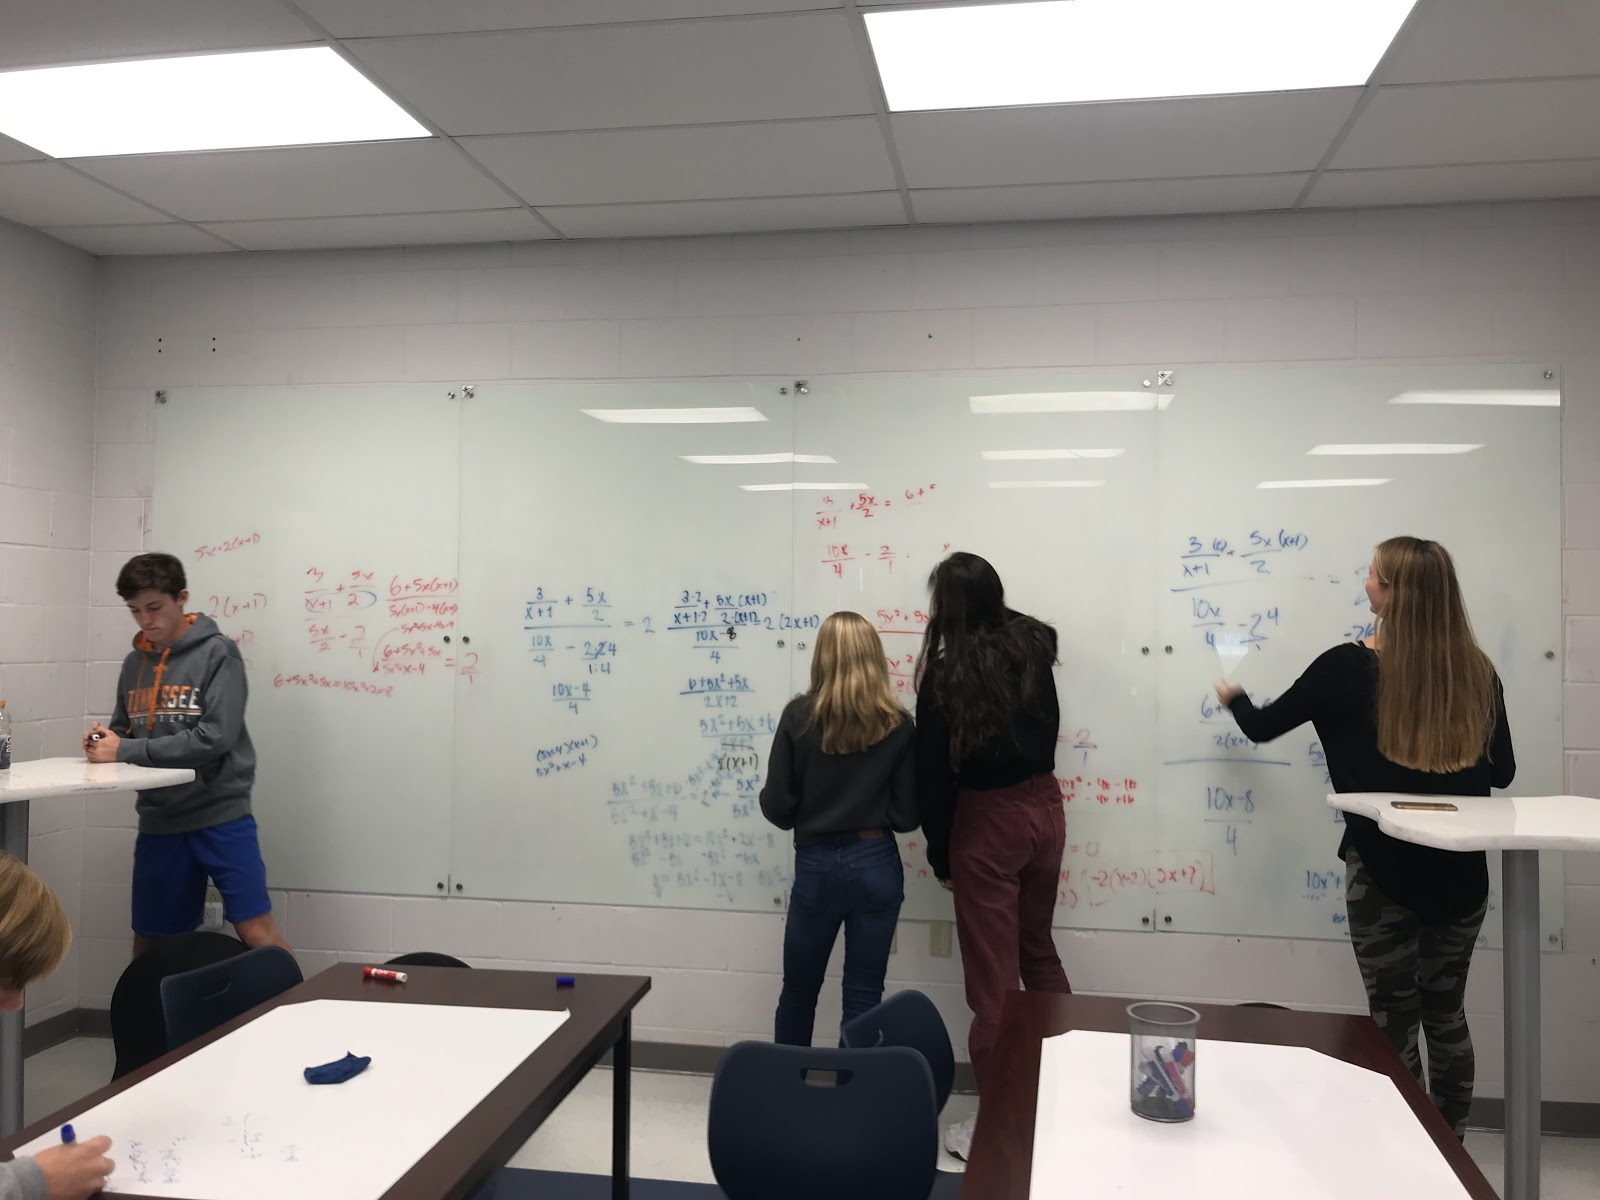 The Thinking Classroom